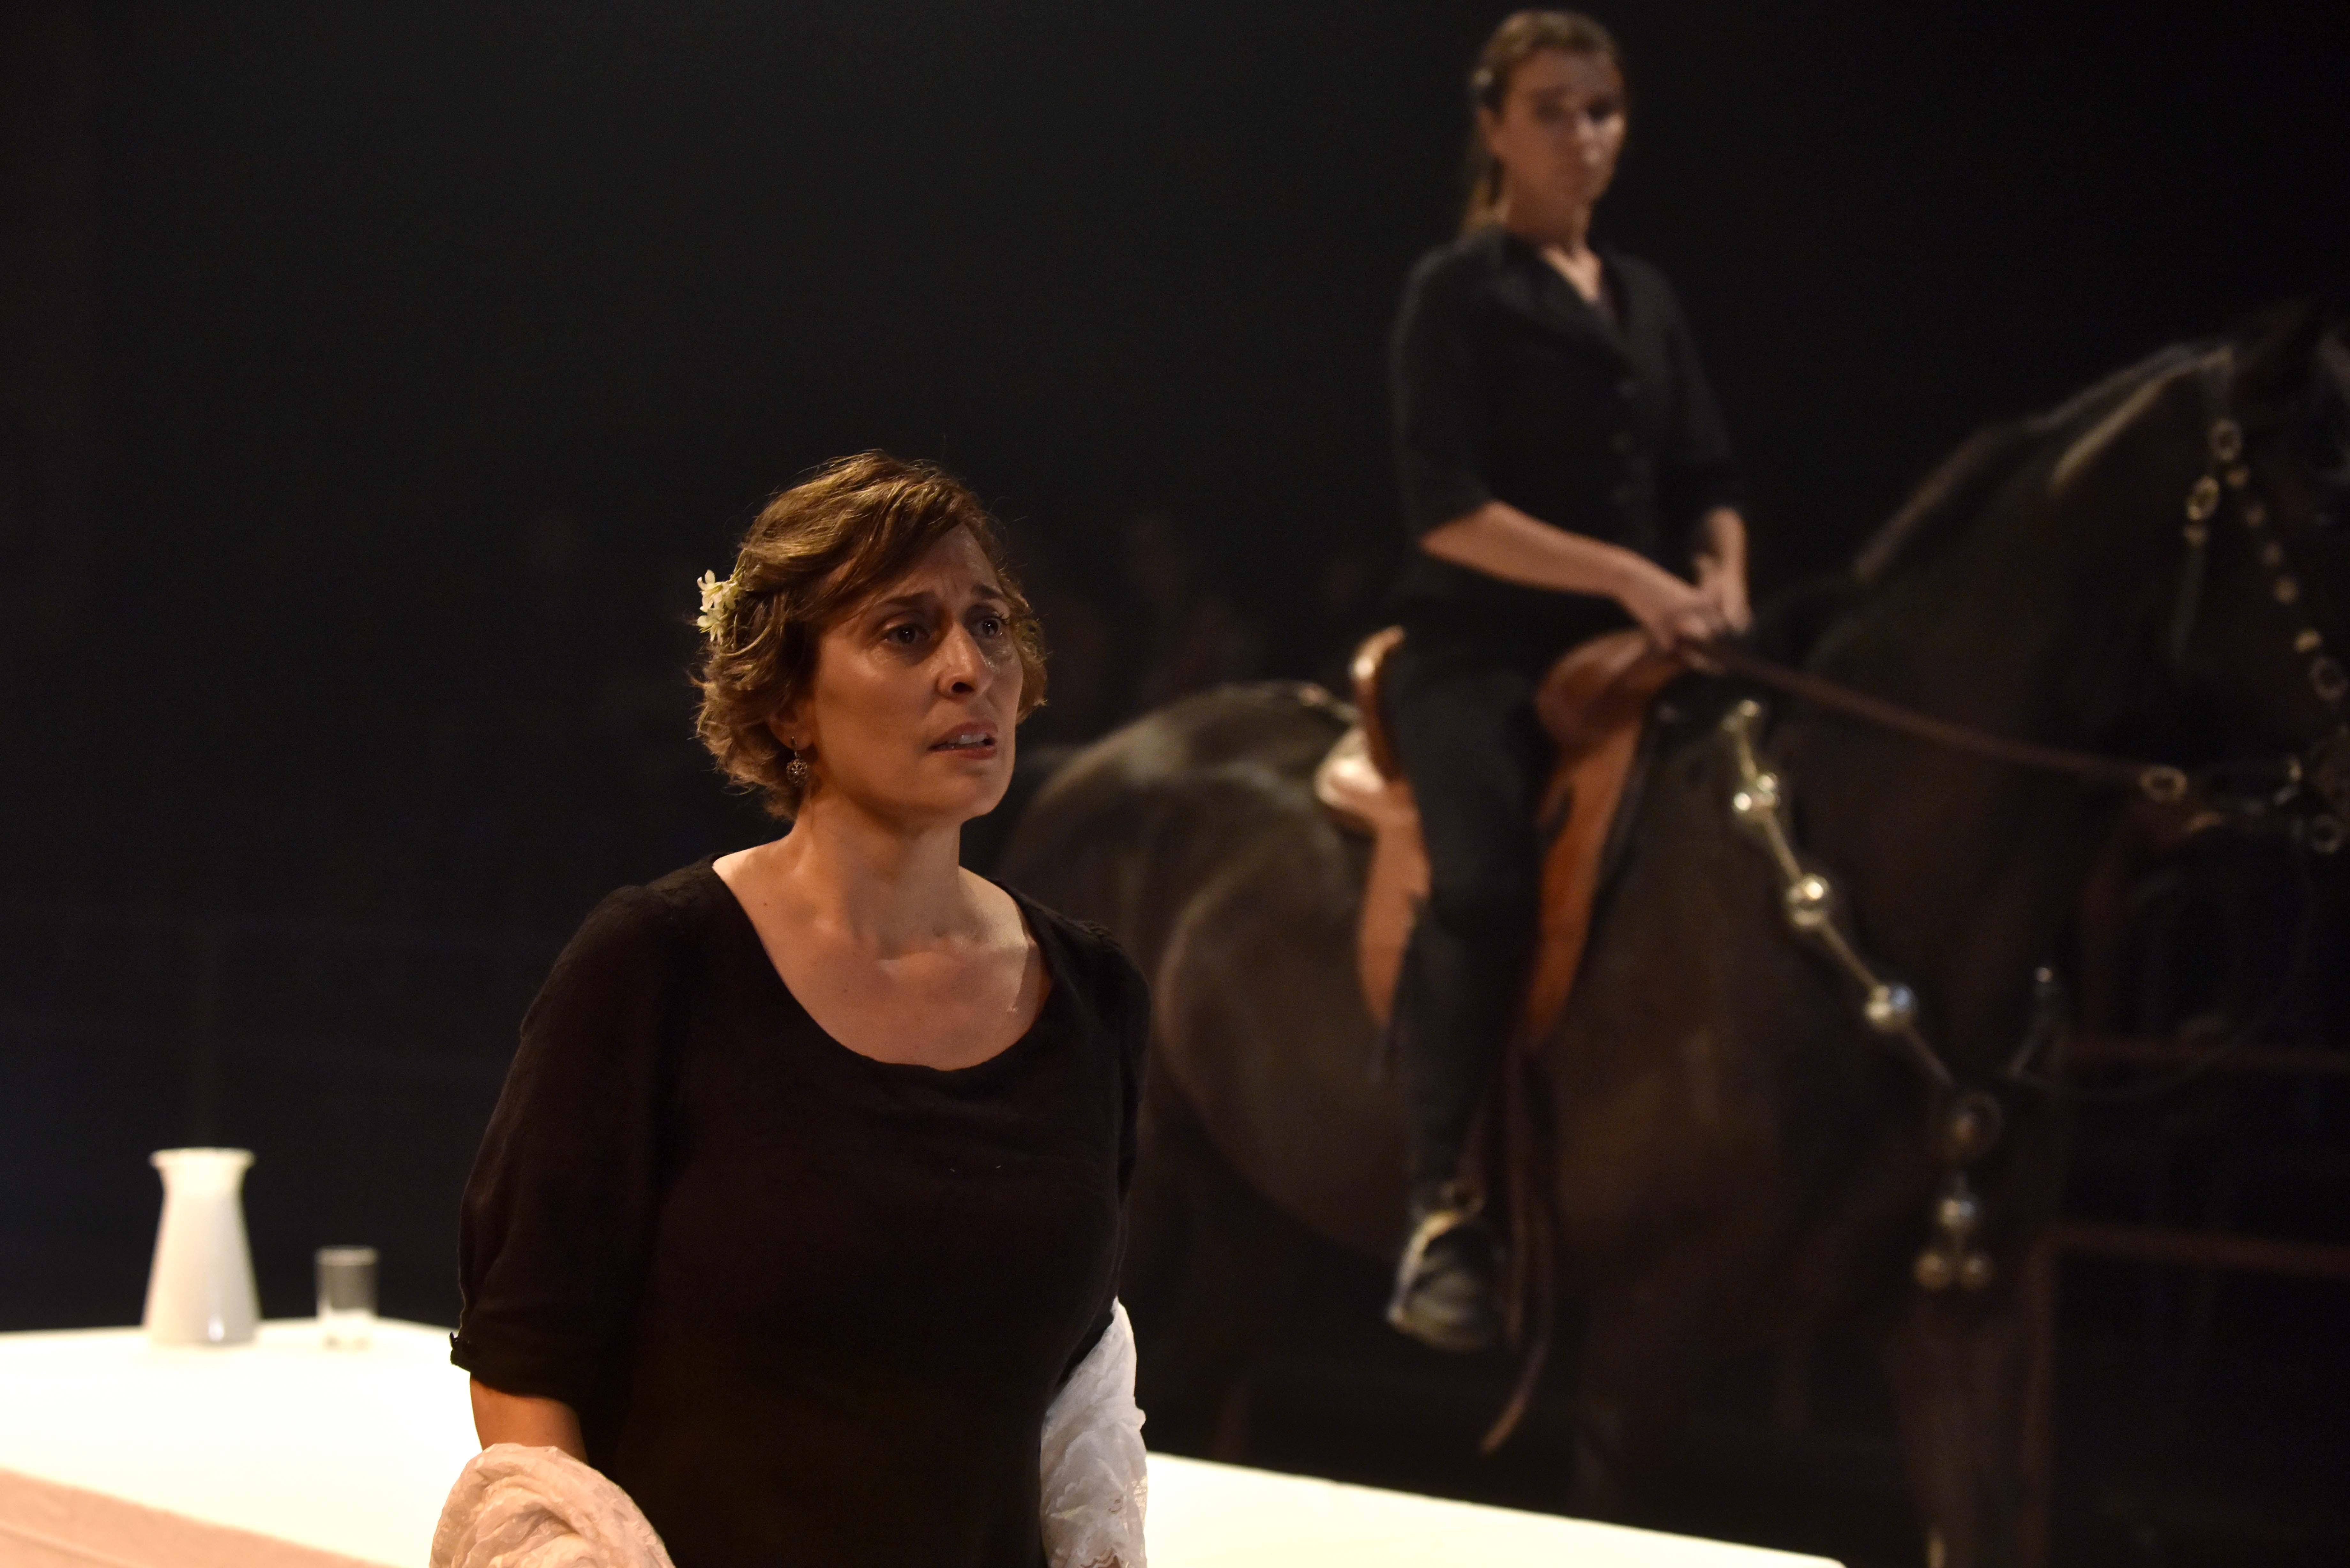 Bodas de sangre dentro del I Festival Internacional Canarias Artes Escénicas